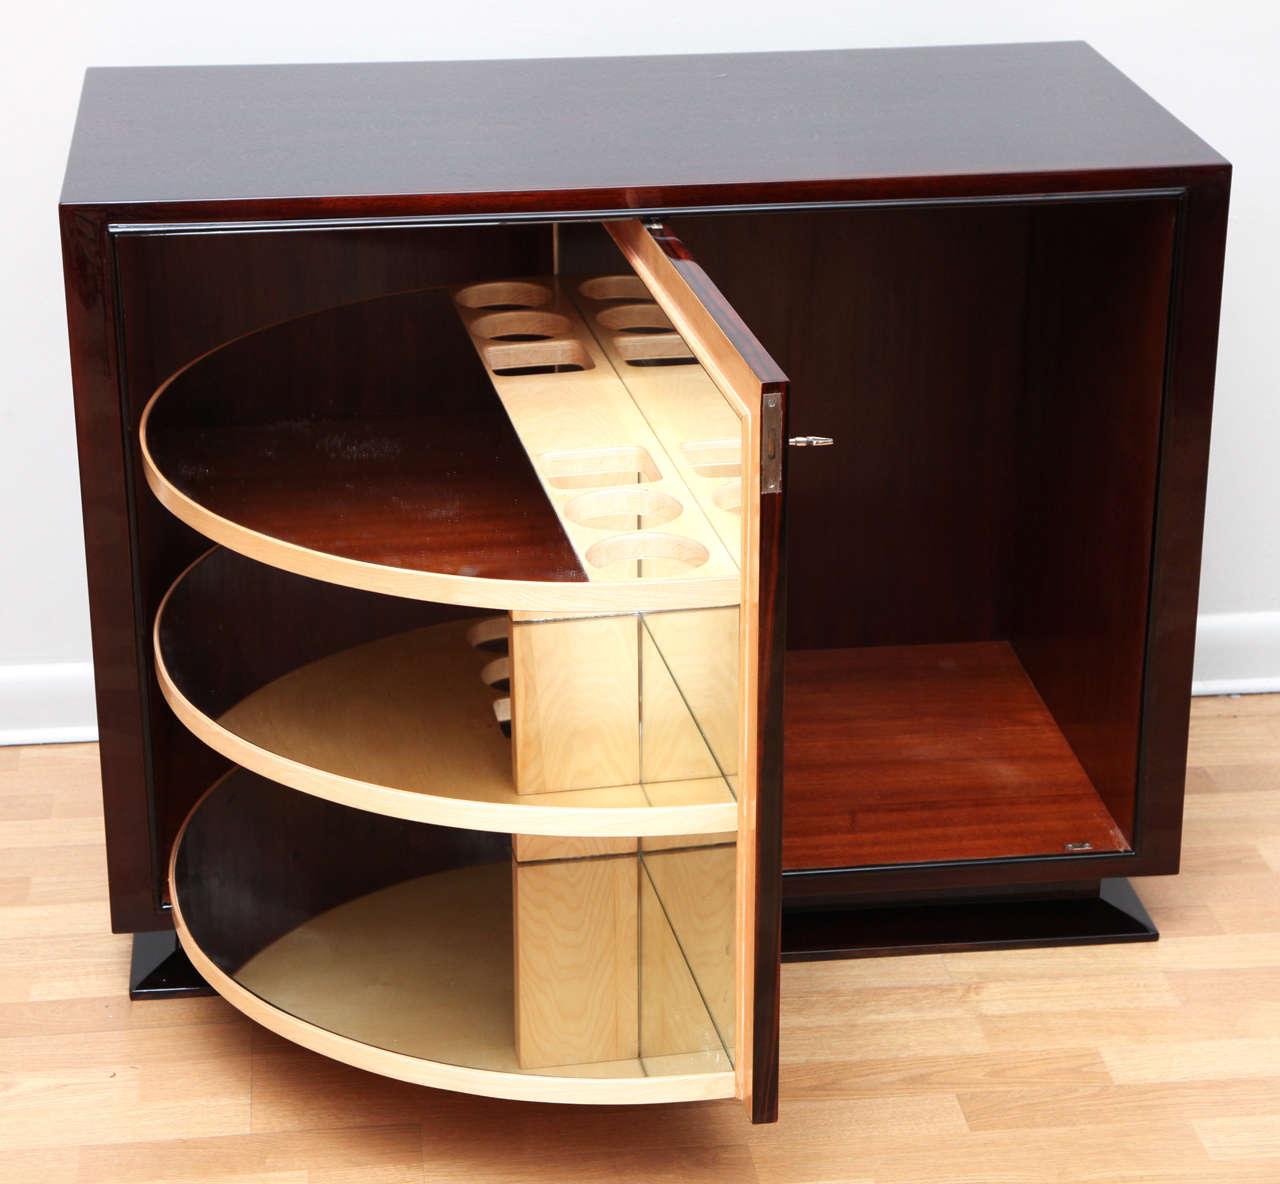 Spectacular art deco revolving bar cabinet image 5 for Art deco bar furniture